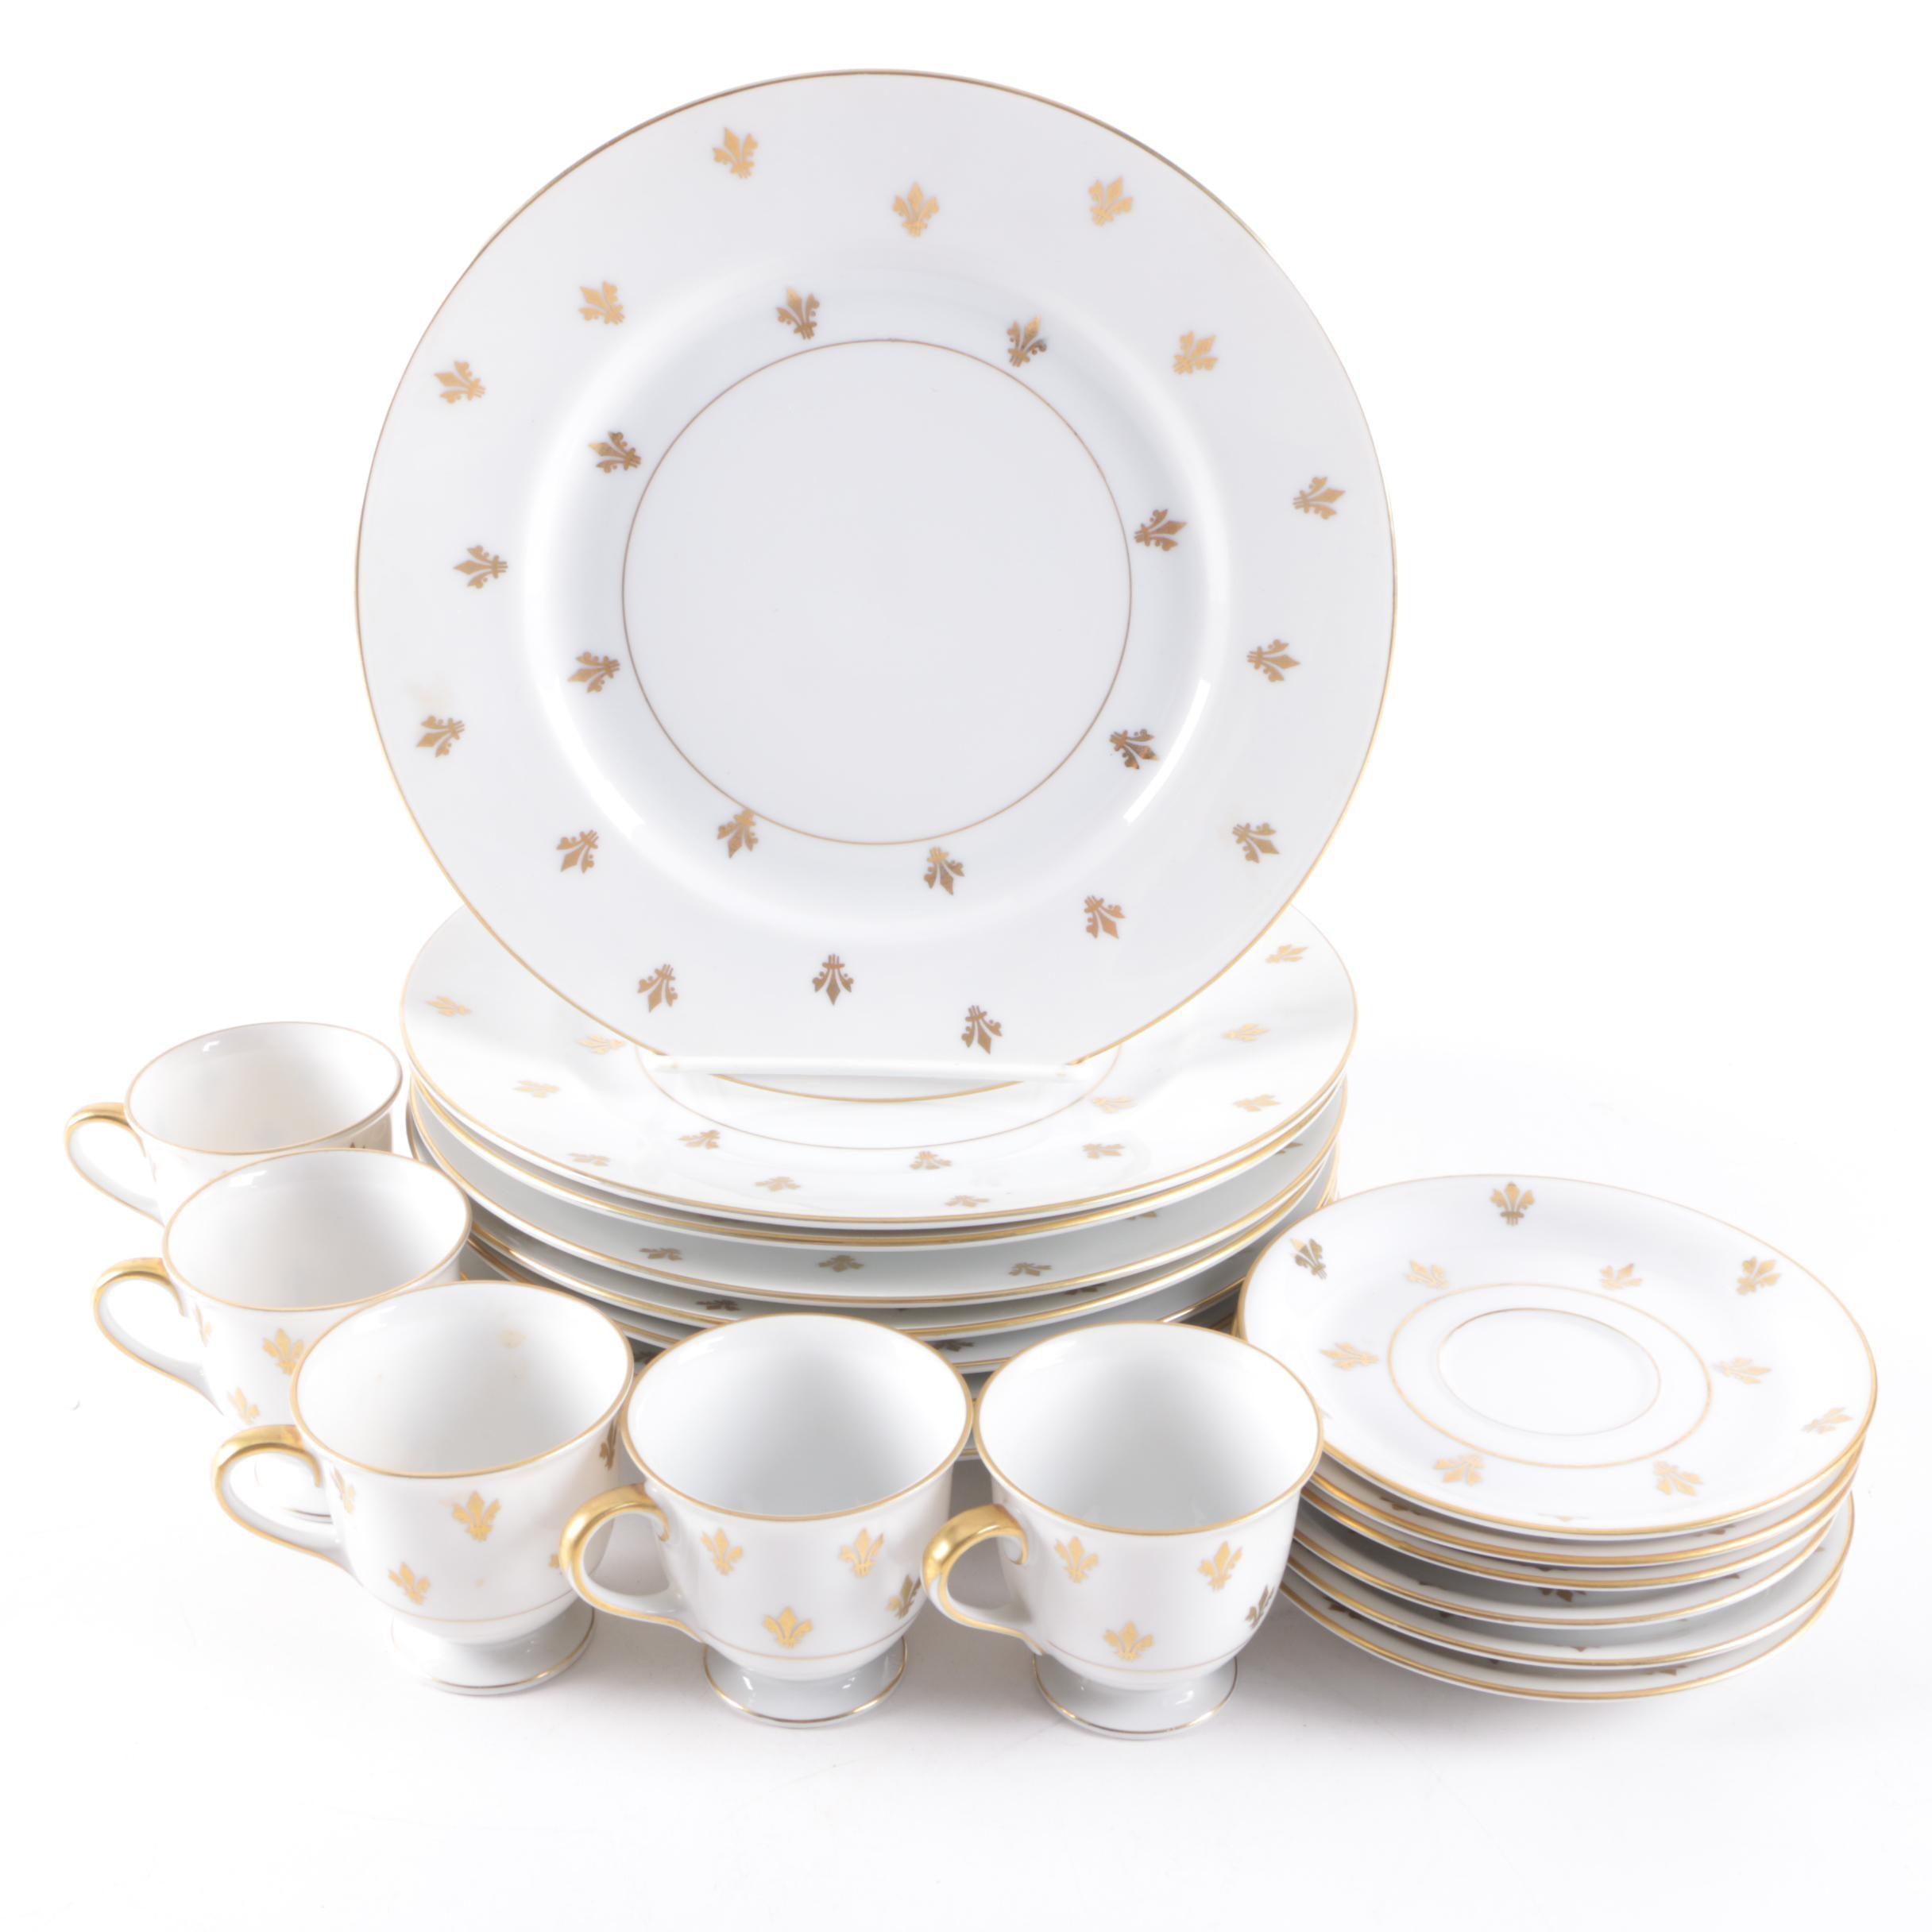 "Eschenbach ""Suzette"" Baronet China Tableware"